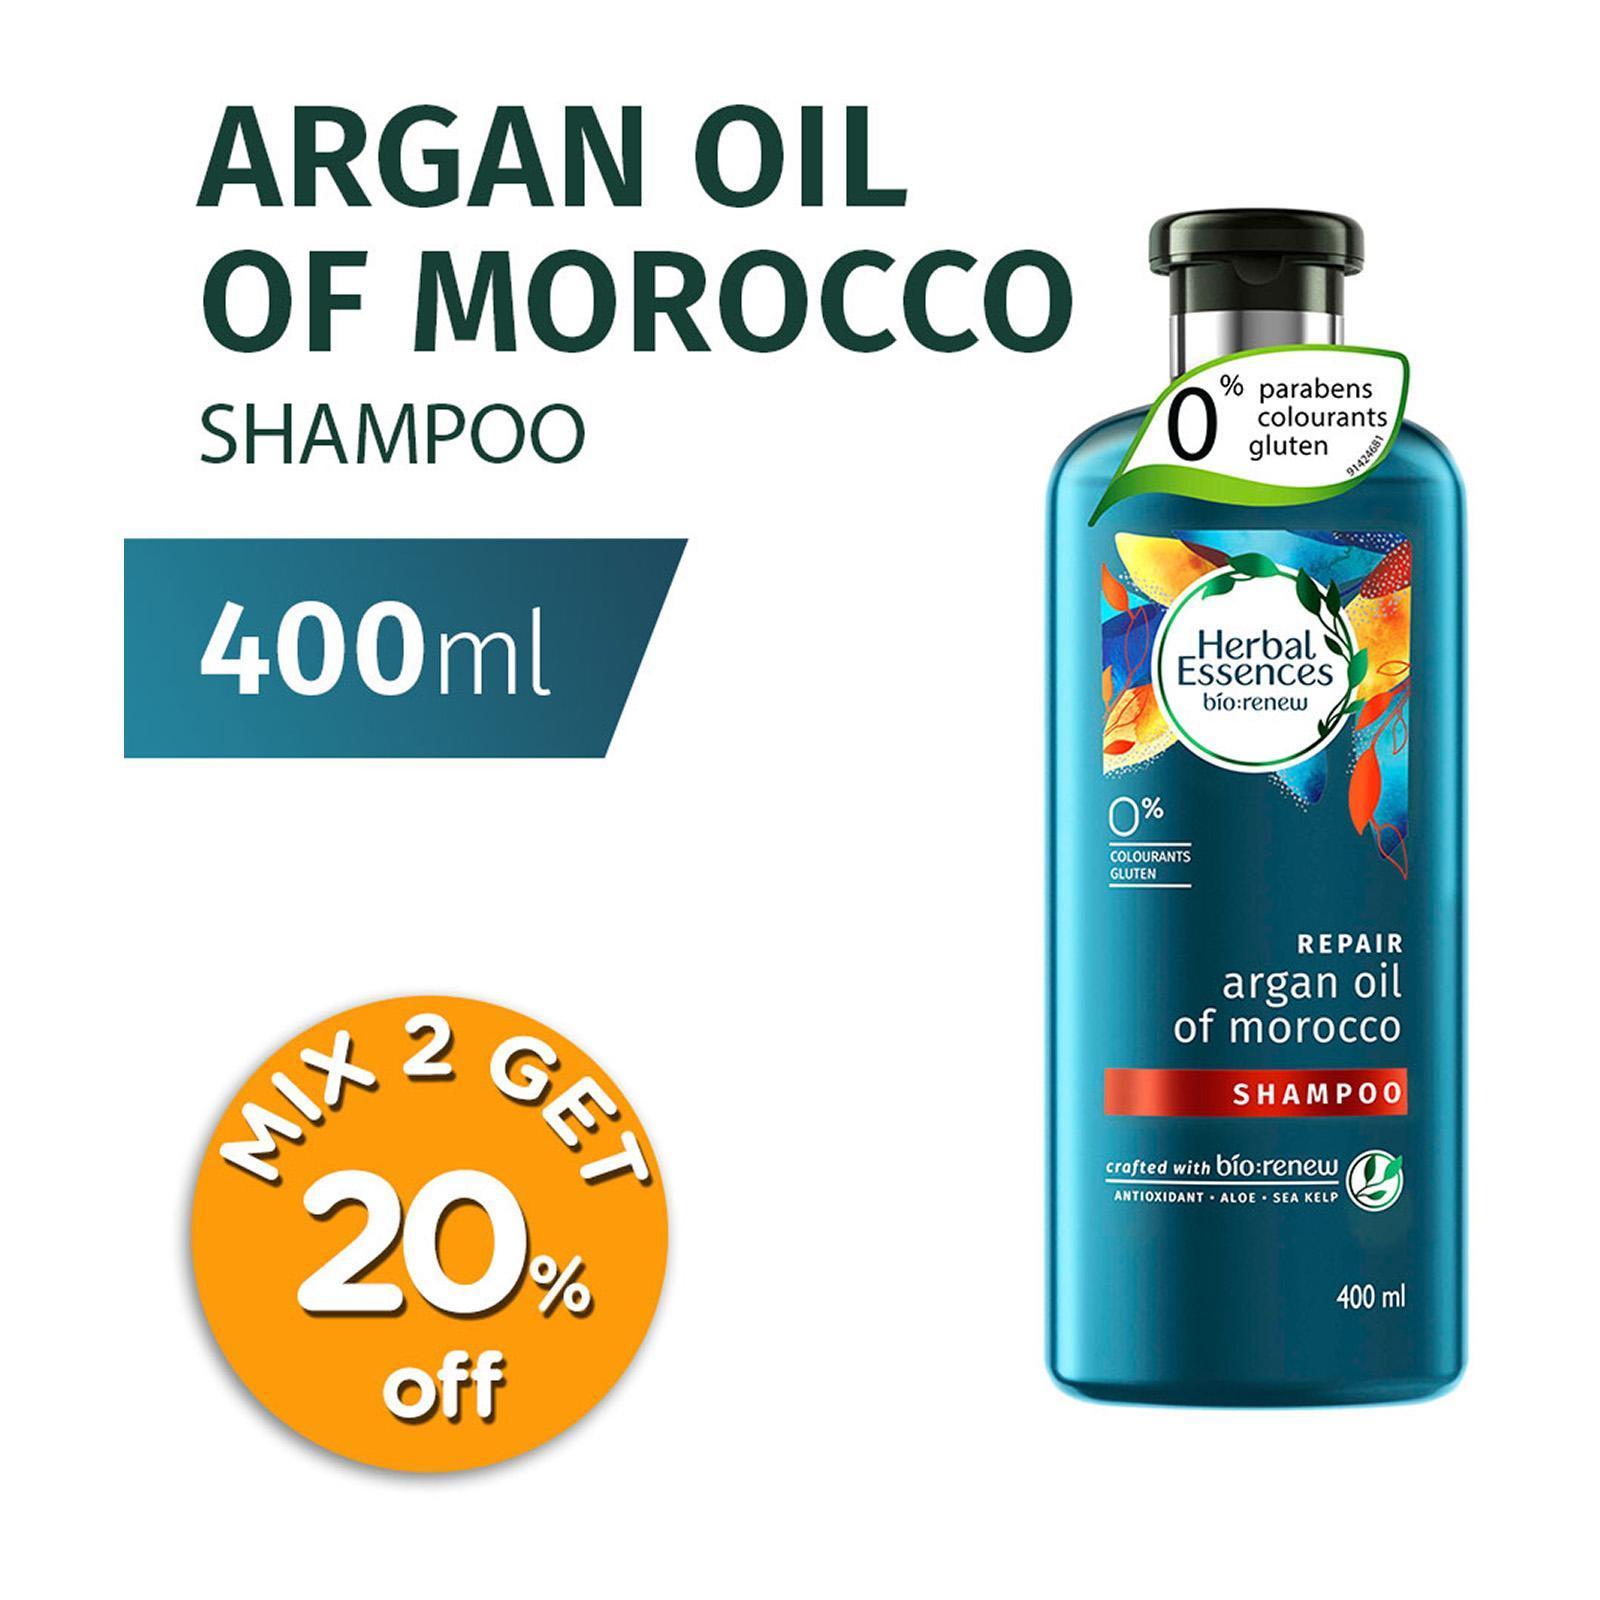 HERBAL ESSENCES herbal essences repair argan oil of morocco shampoo 400ml